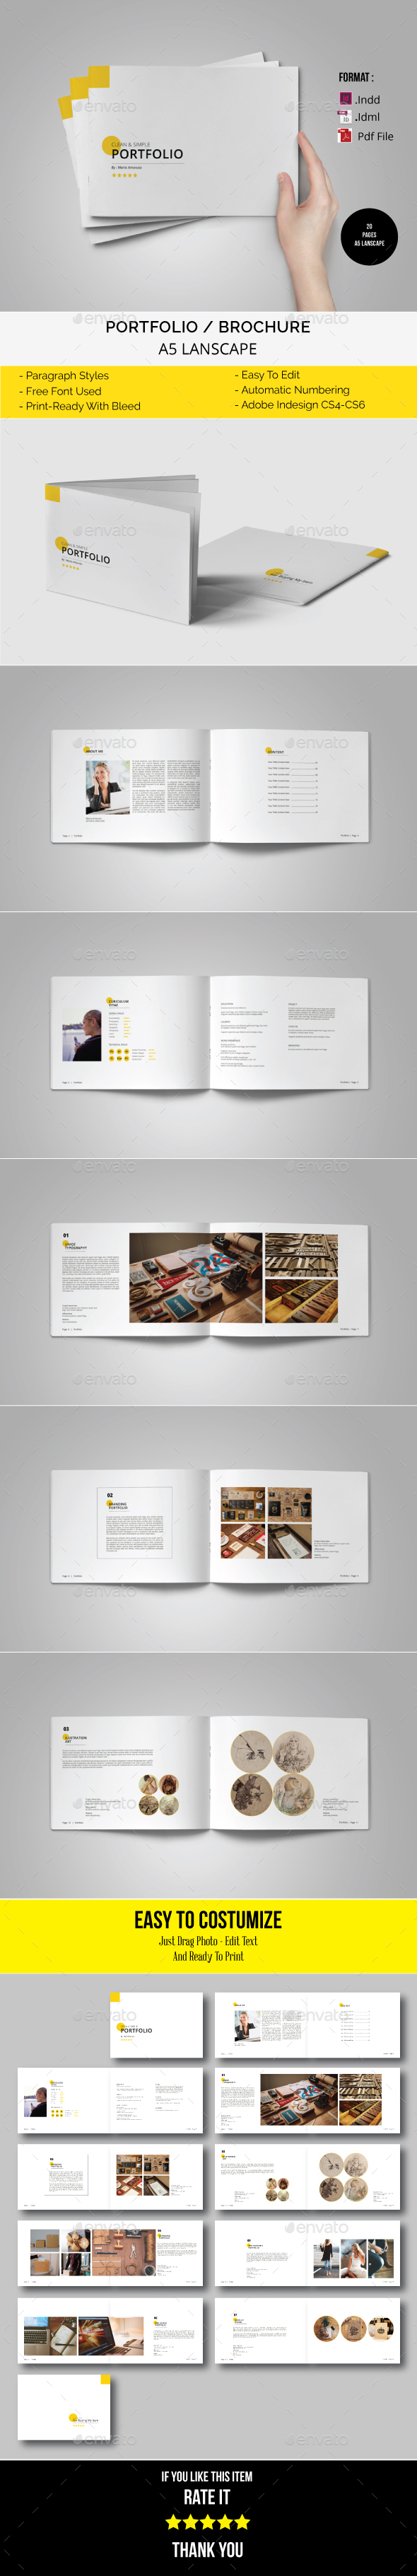 GraphicRiver A5 Lanscape Brochure Portfolio 21096393